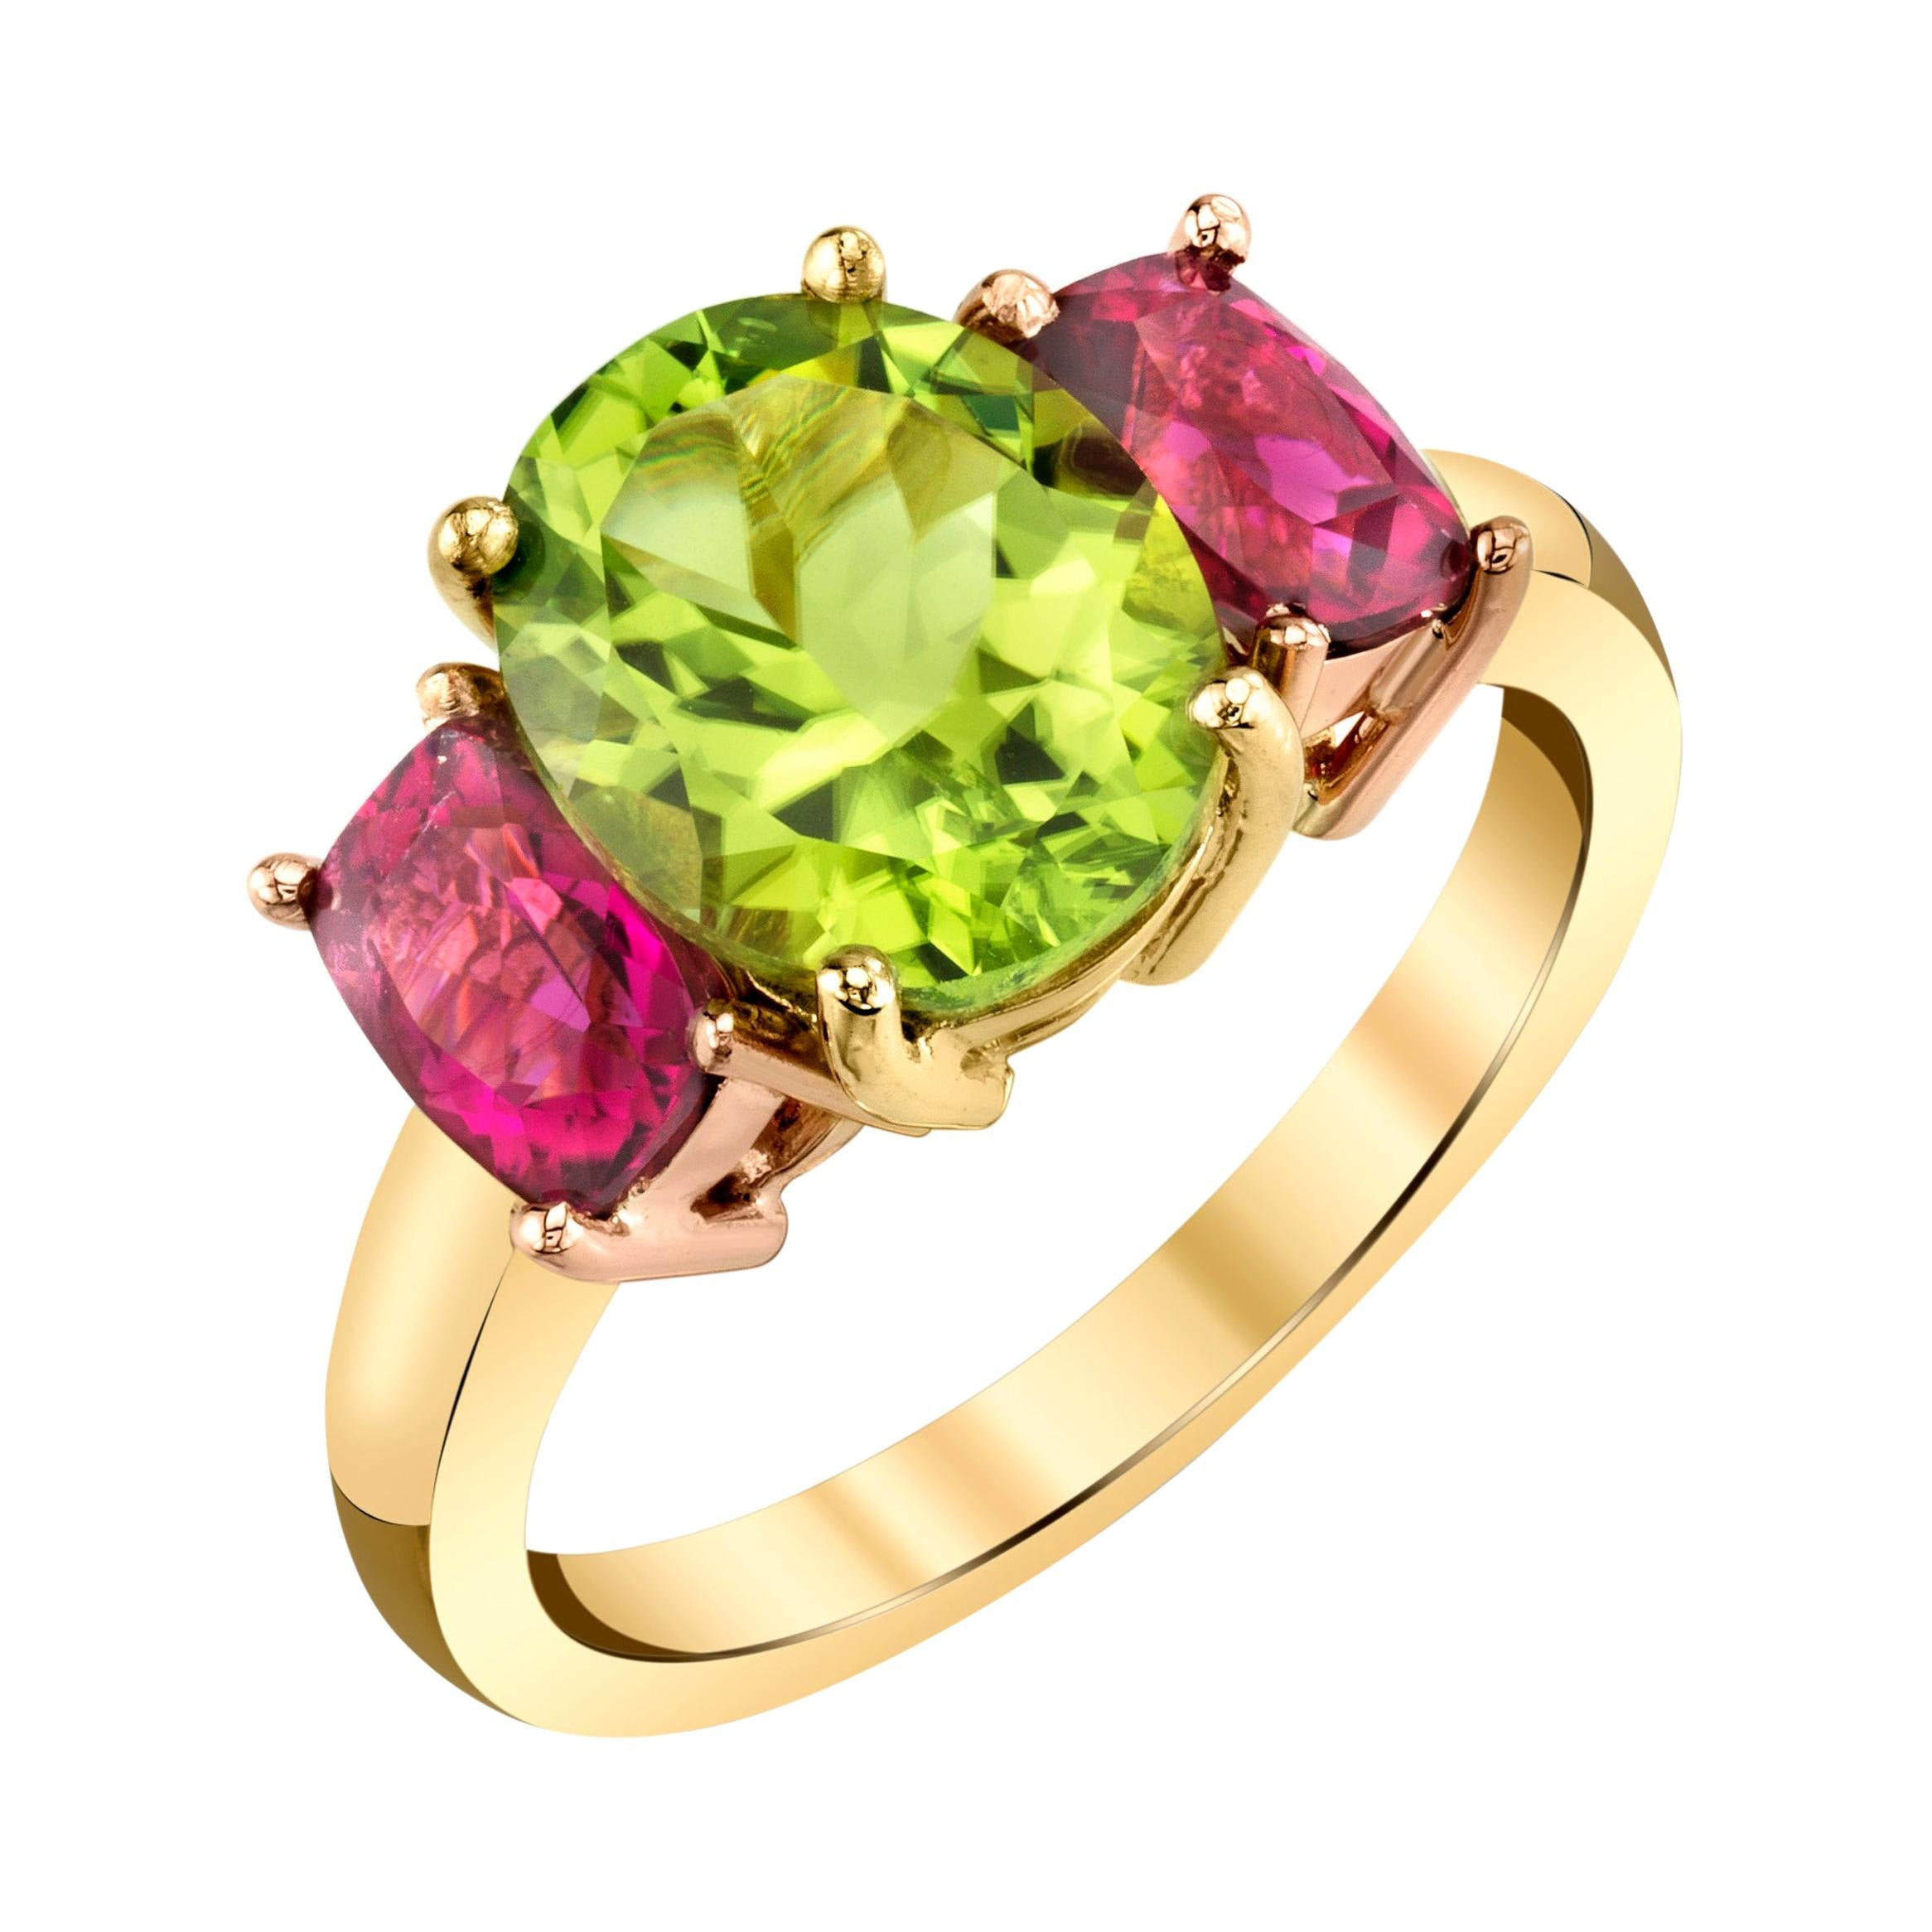 2.73 Carat Peridot & Tourmaline, Yellow & Rose Gold 3-Stone Cocktail Ring